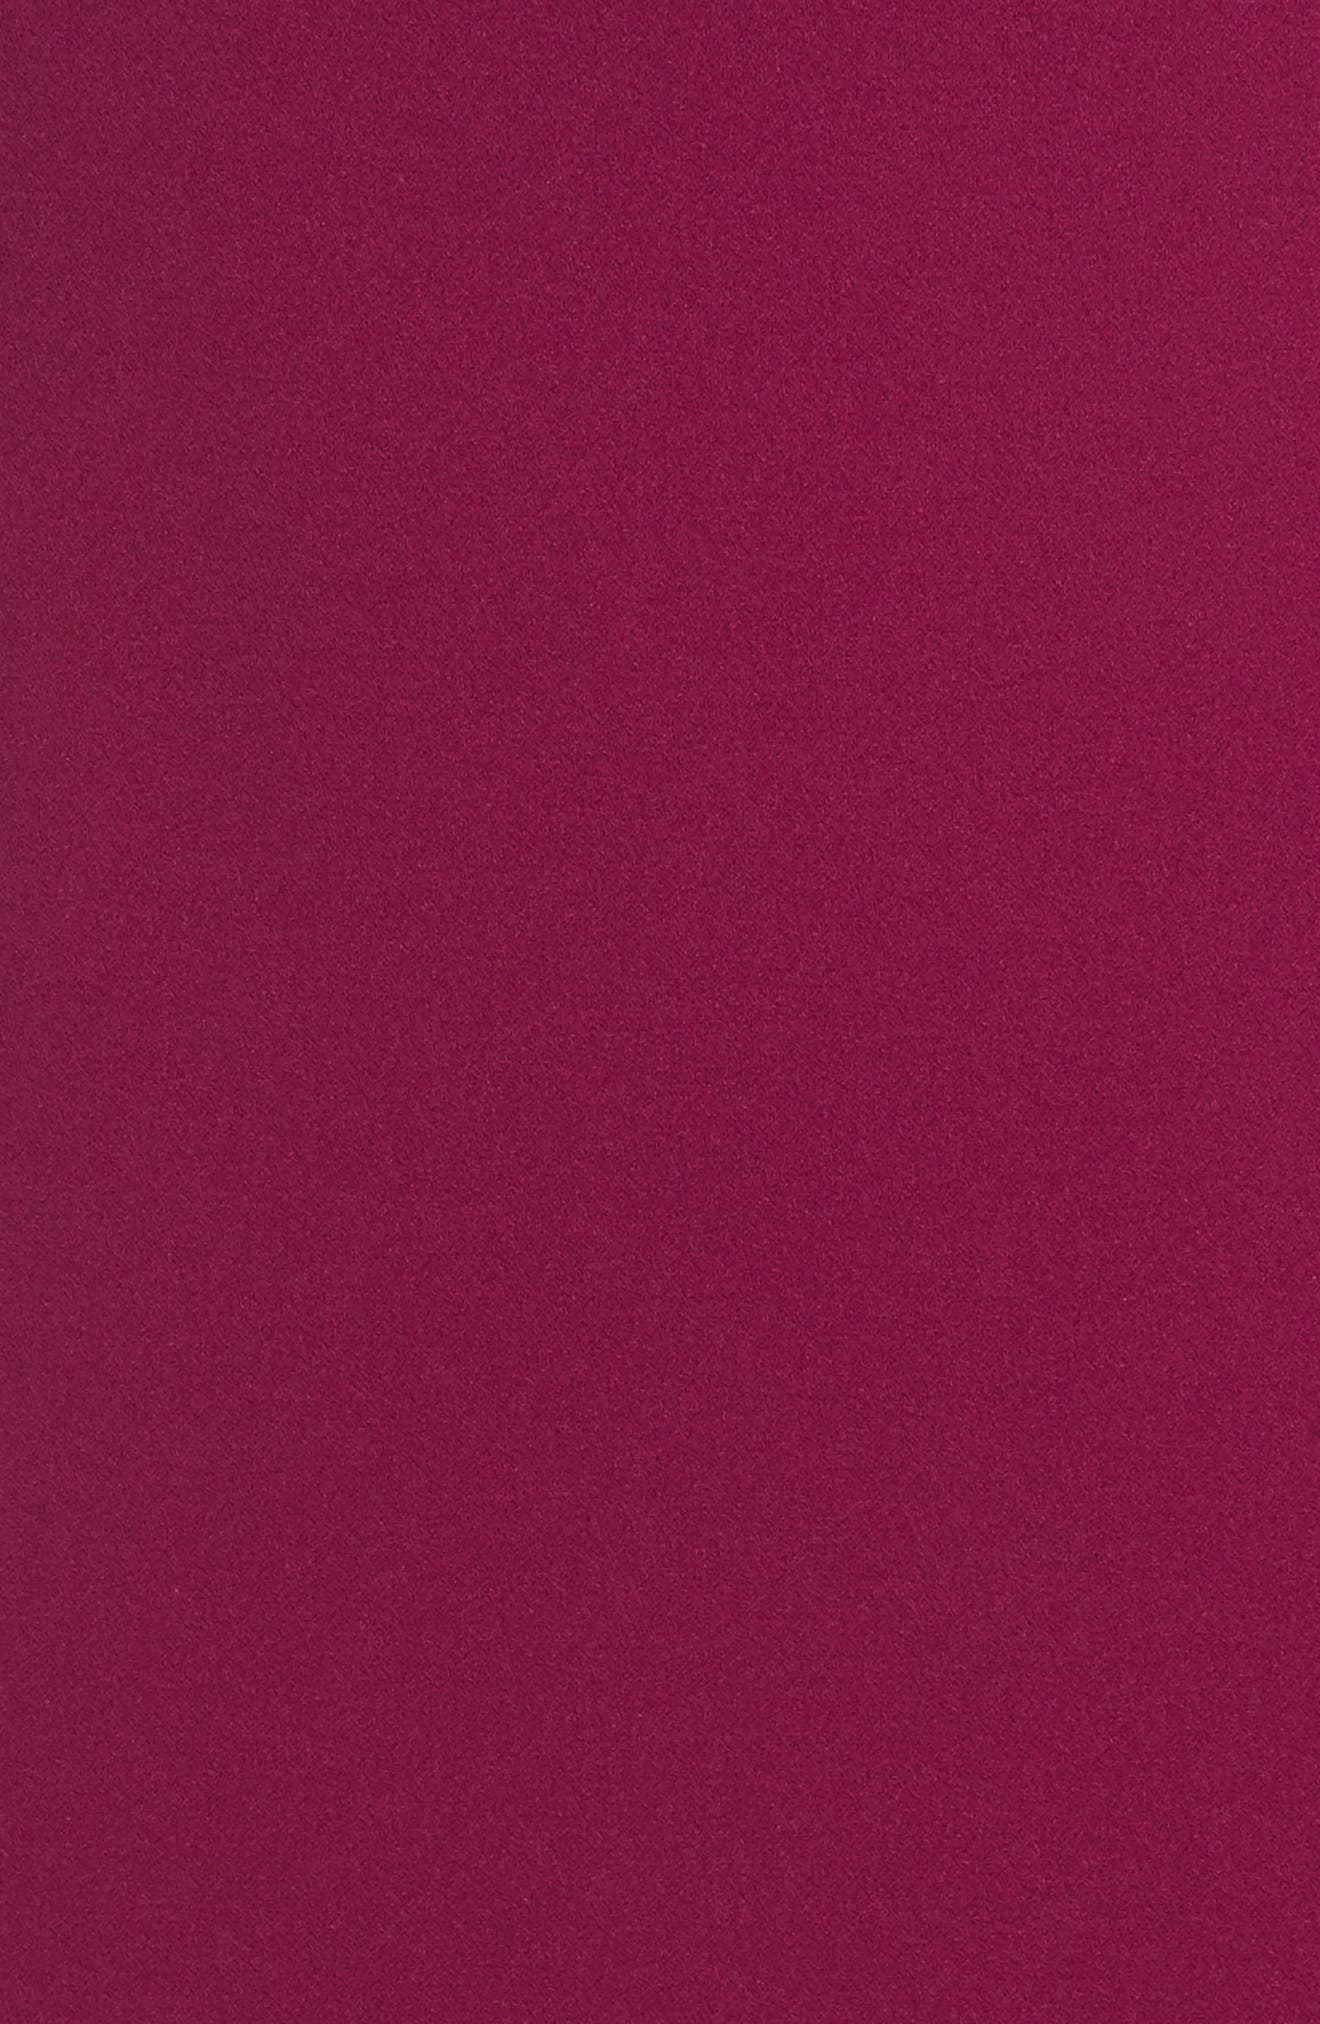 Cold Shoulder Gown,                             Alternate thumbnail 5, color,                             641